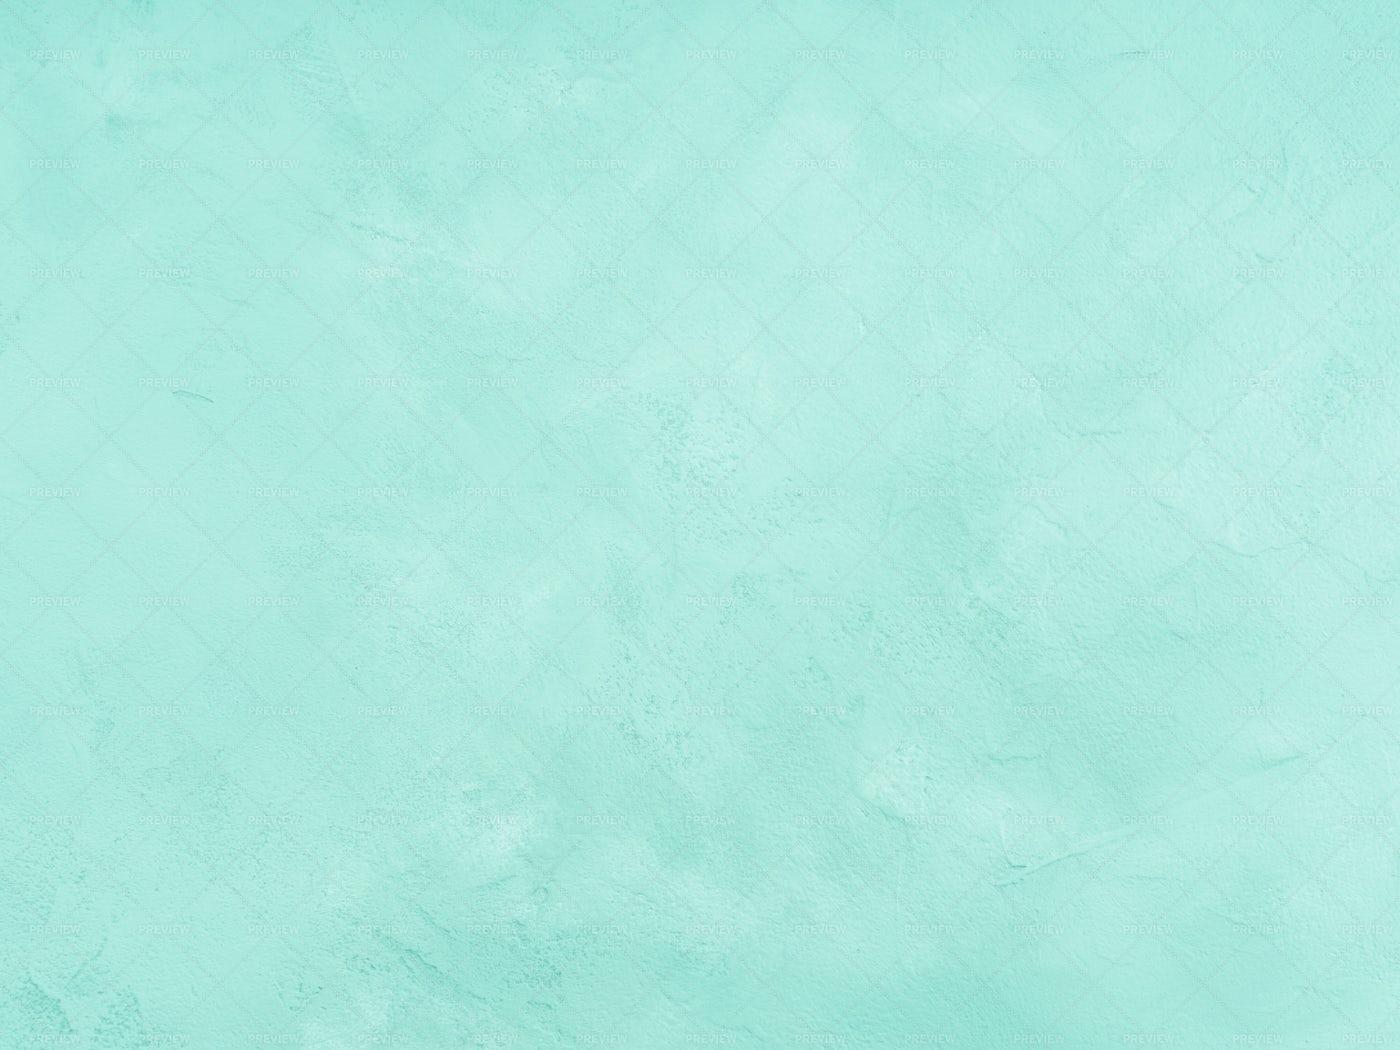 Blue Textured Background: Stock Photos